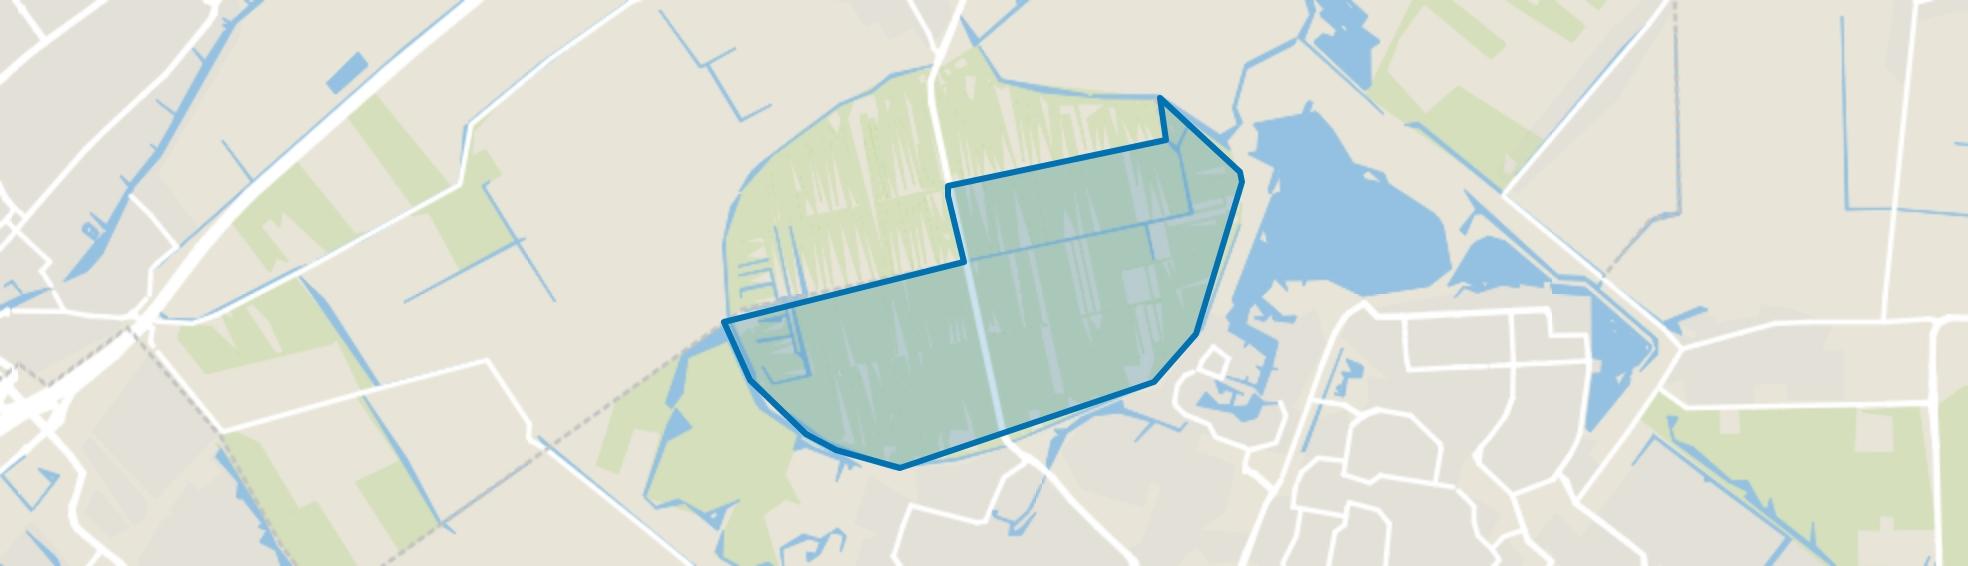 Meerpolder, Zoetermeer map